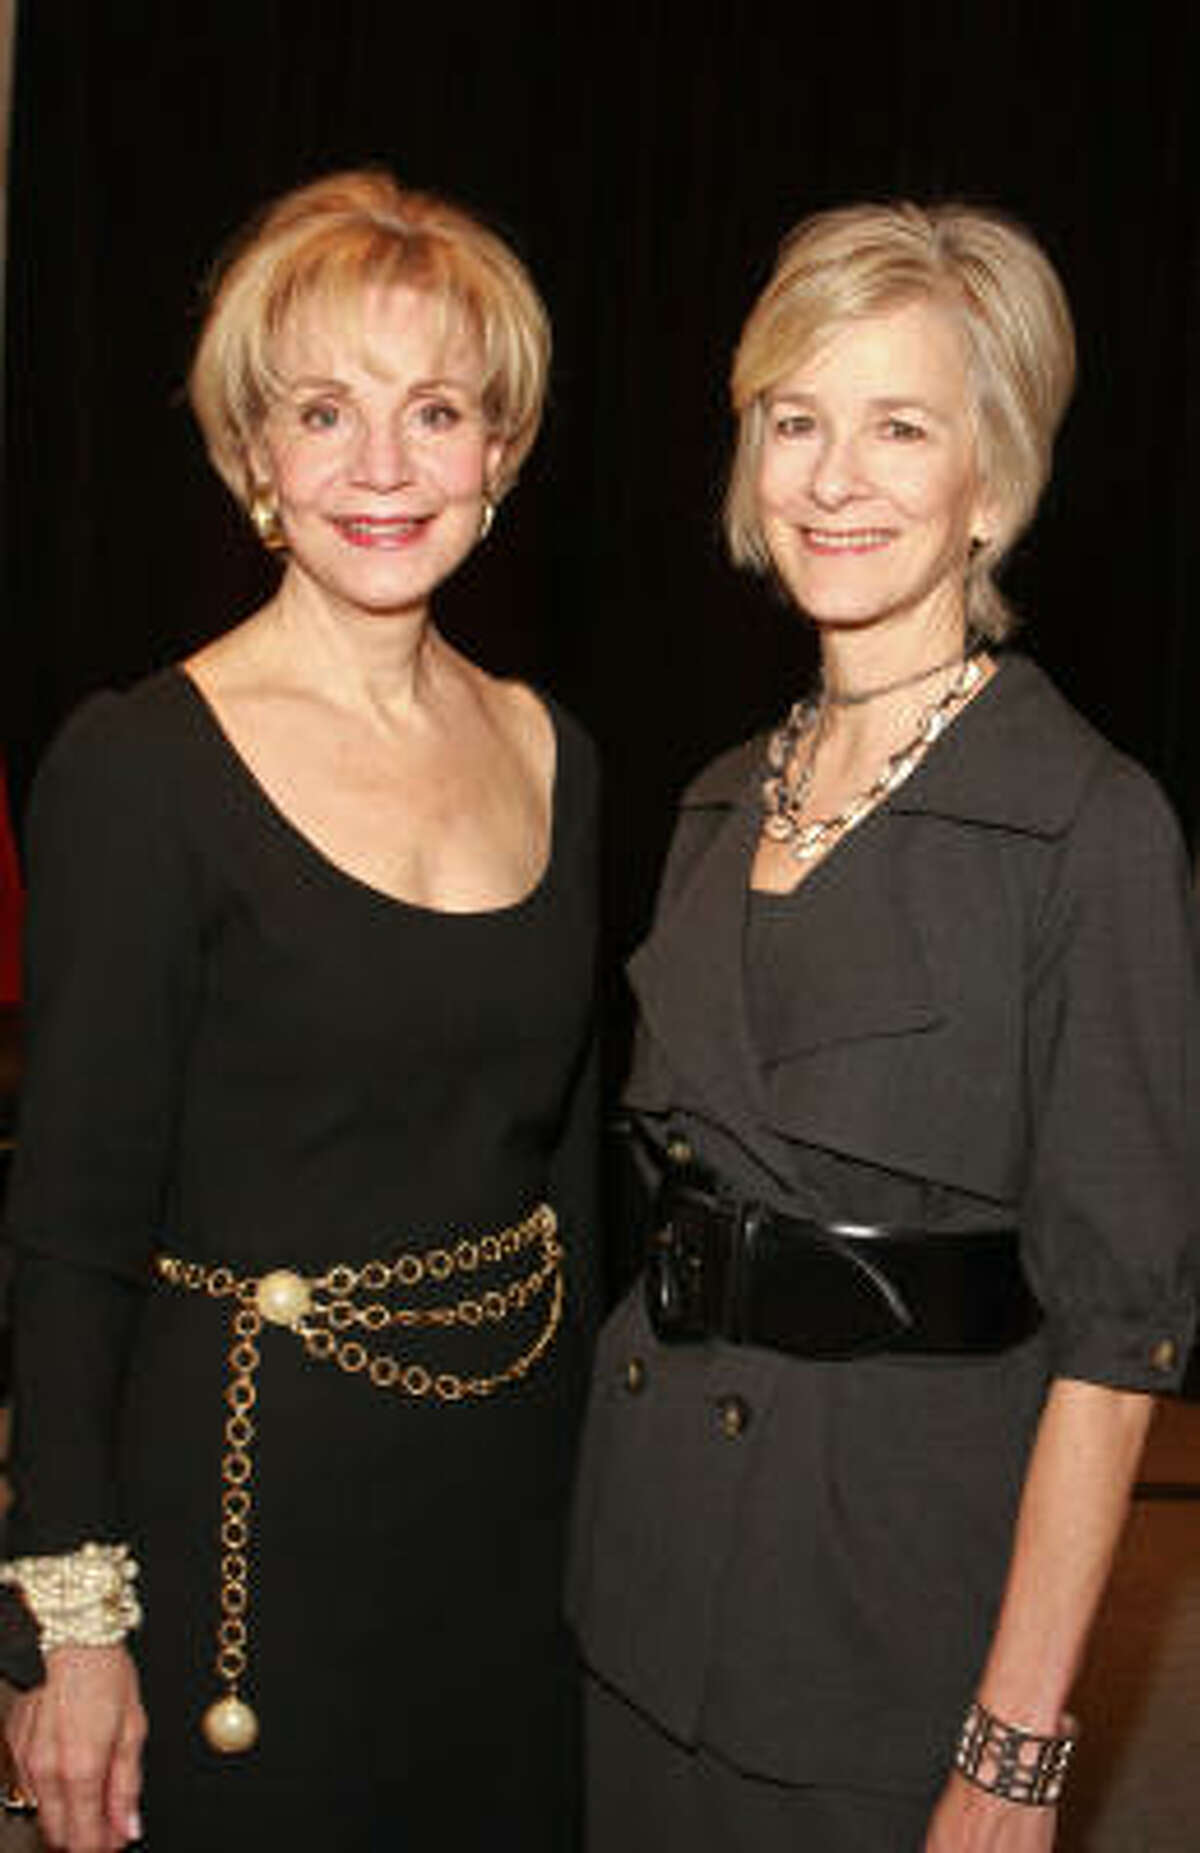 Leisa Holland-Nelson, left, and Dana Buchman